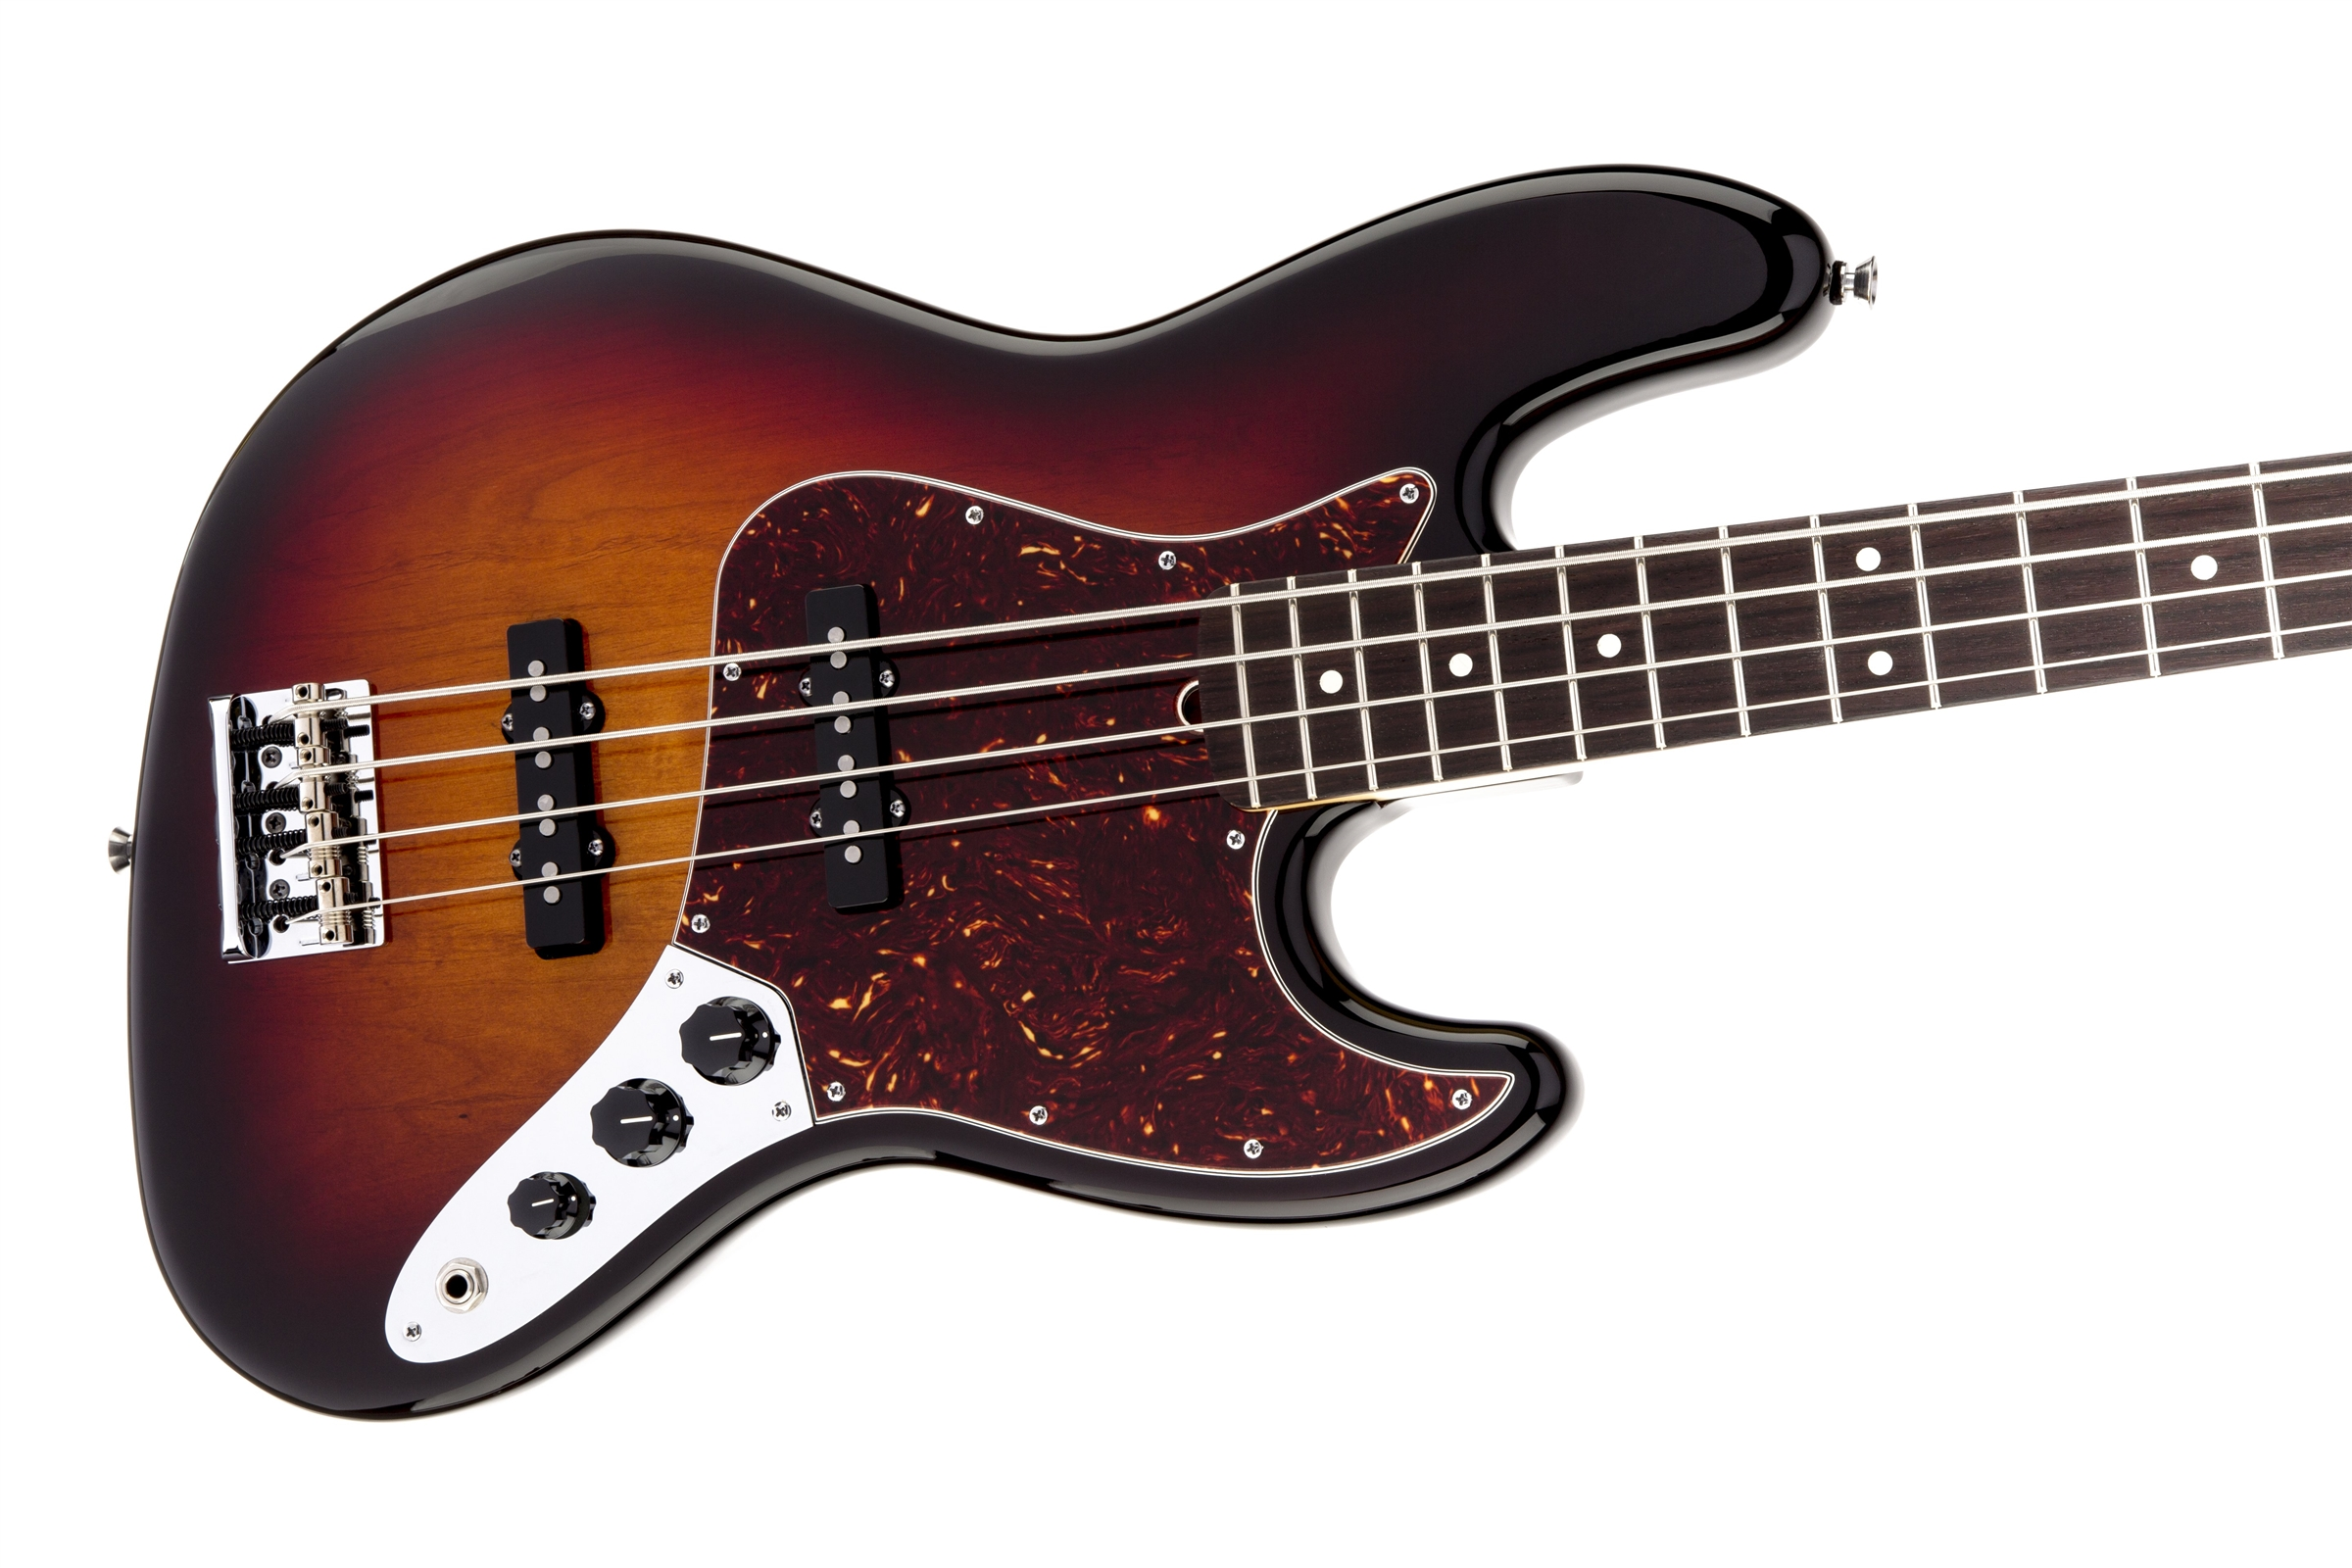 Fender American Standard Jazz Bass® 3-Color Sunburst Rosewood Fingerboard Electric Bass Guitar